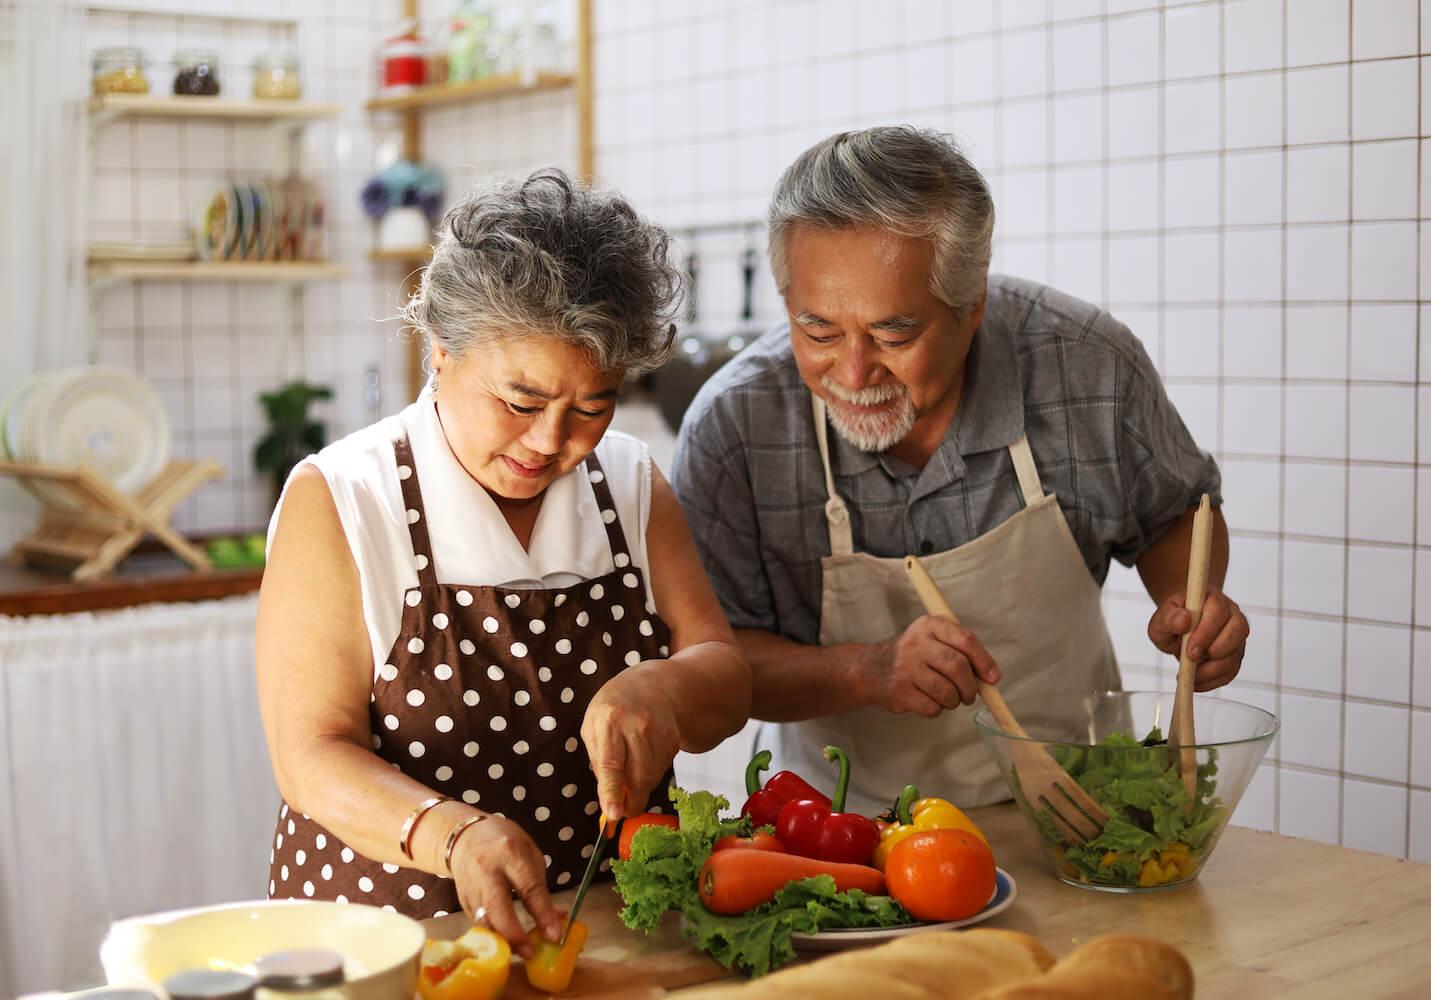 Senior couple preparing a healthy meal